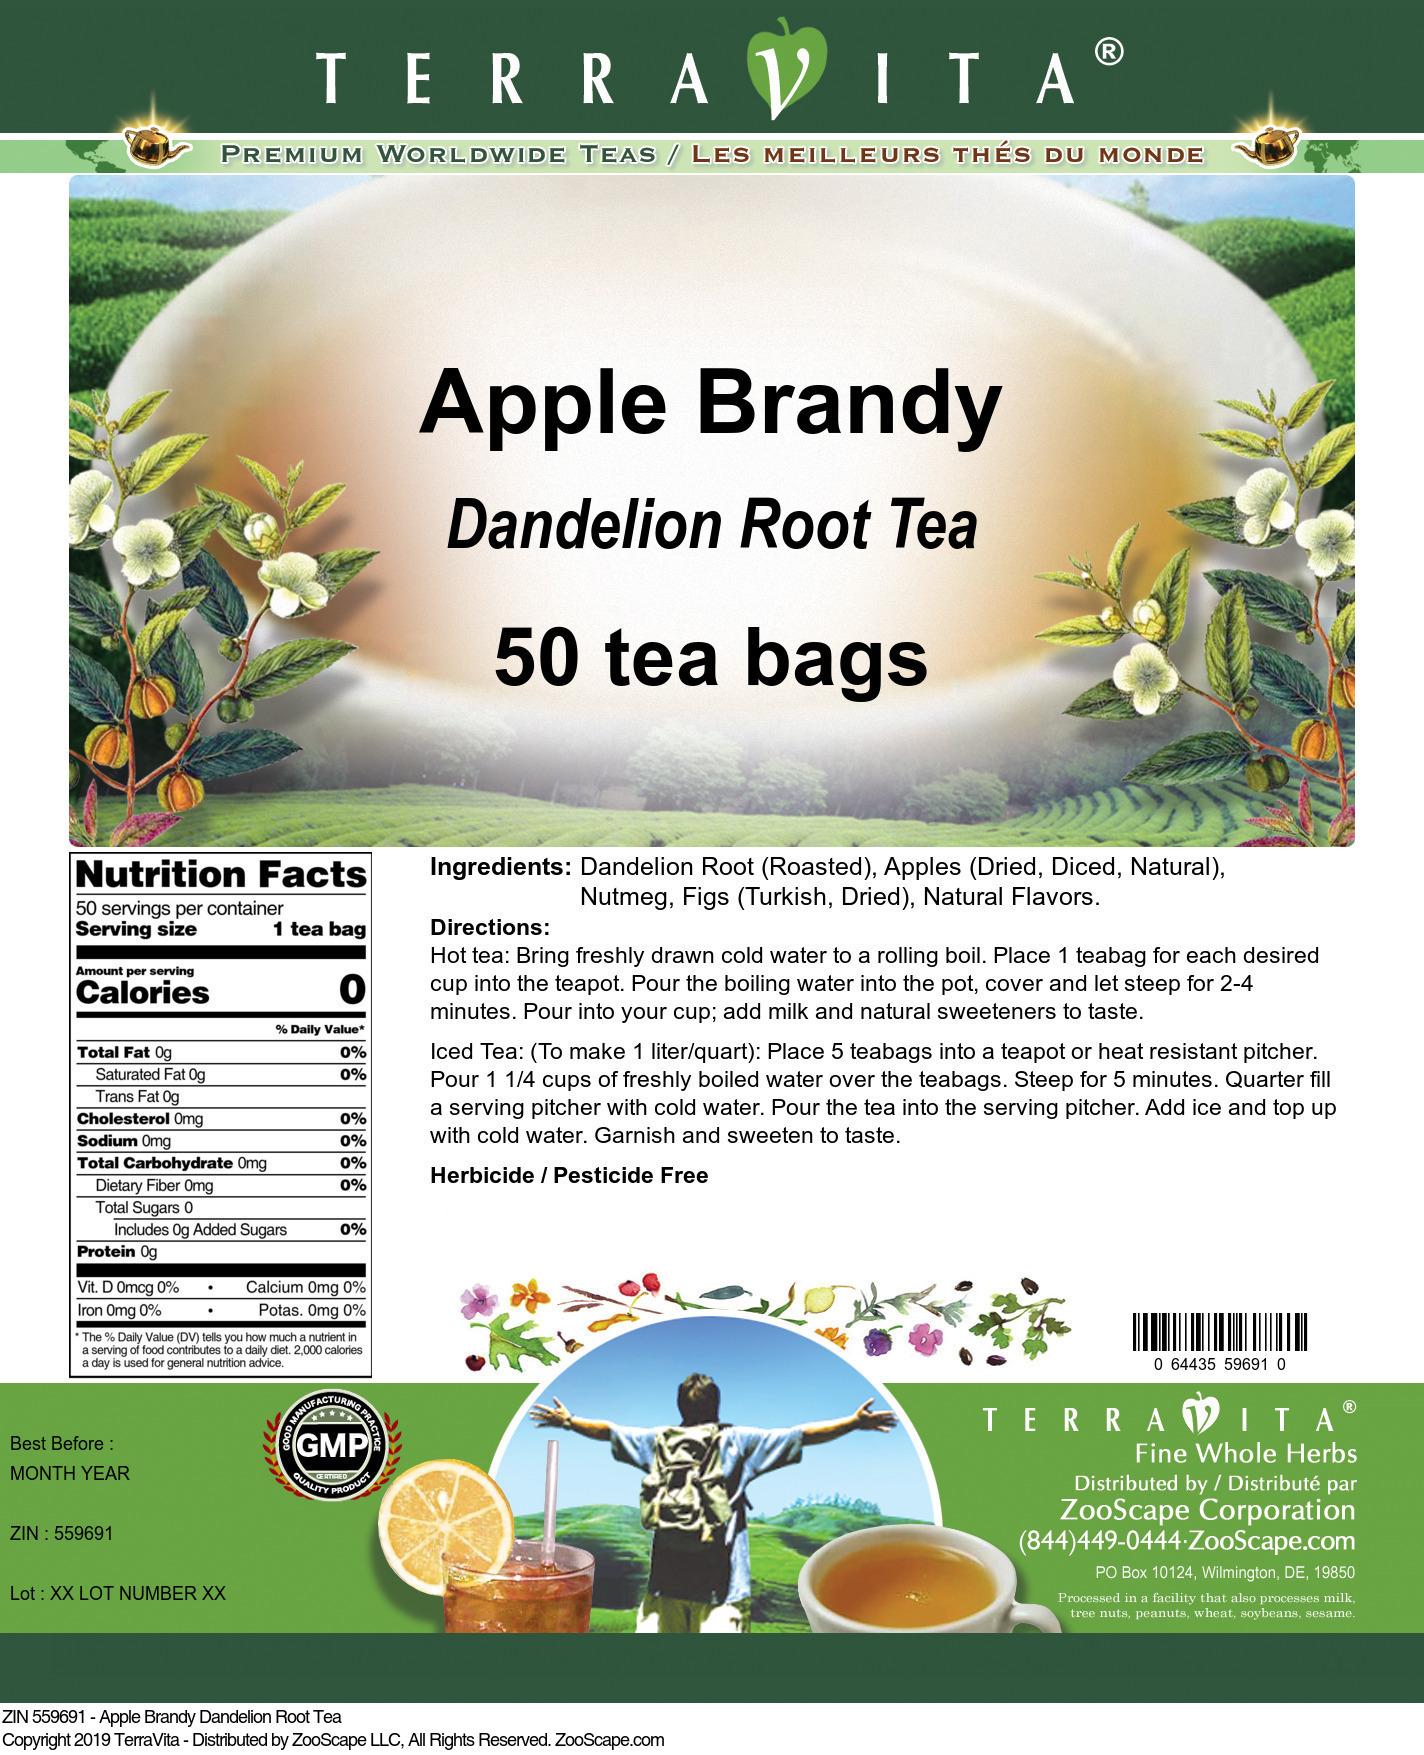 Apple Brandy Dandelion Root